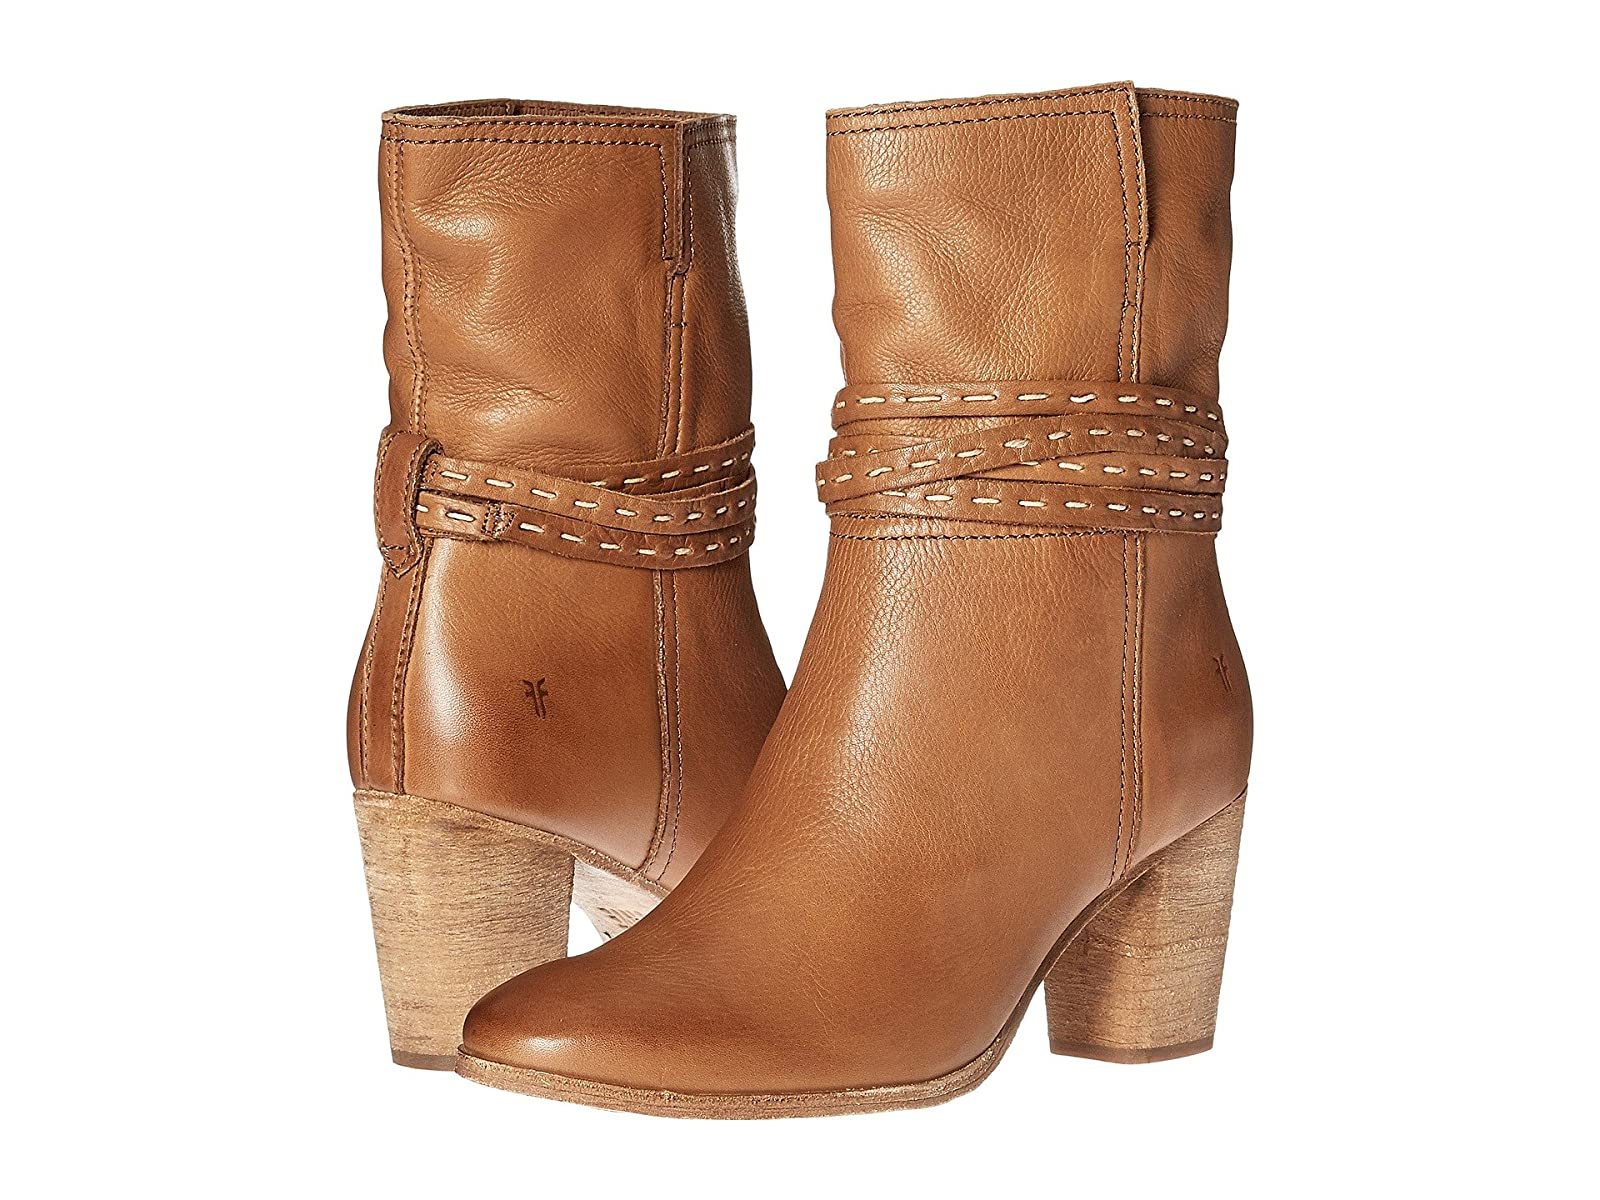 Frye Naomi Pickstitch MidCheap and distinctive eye-catching shoes